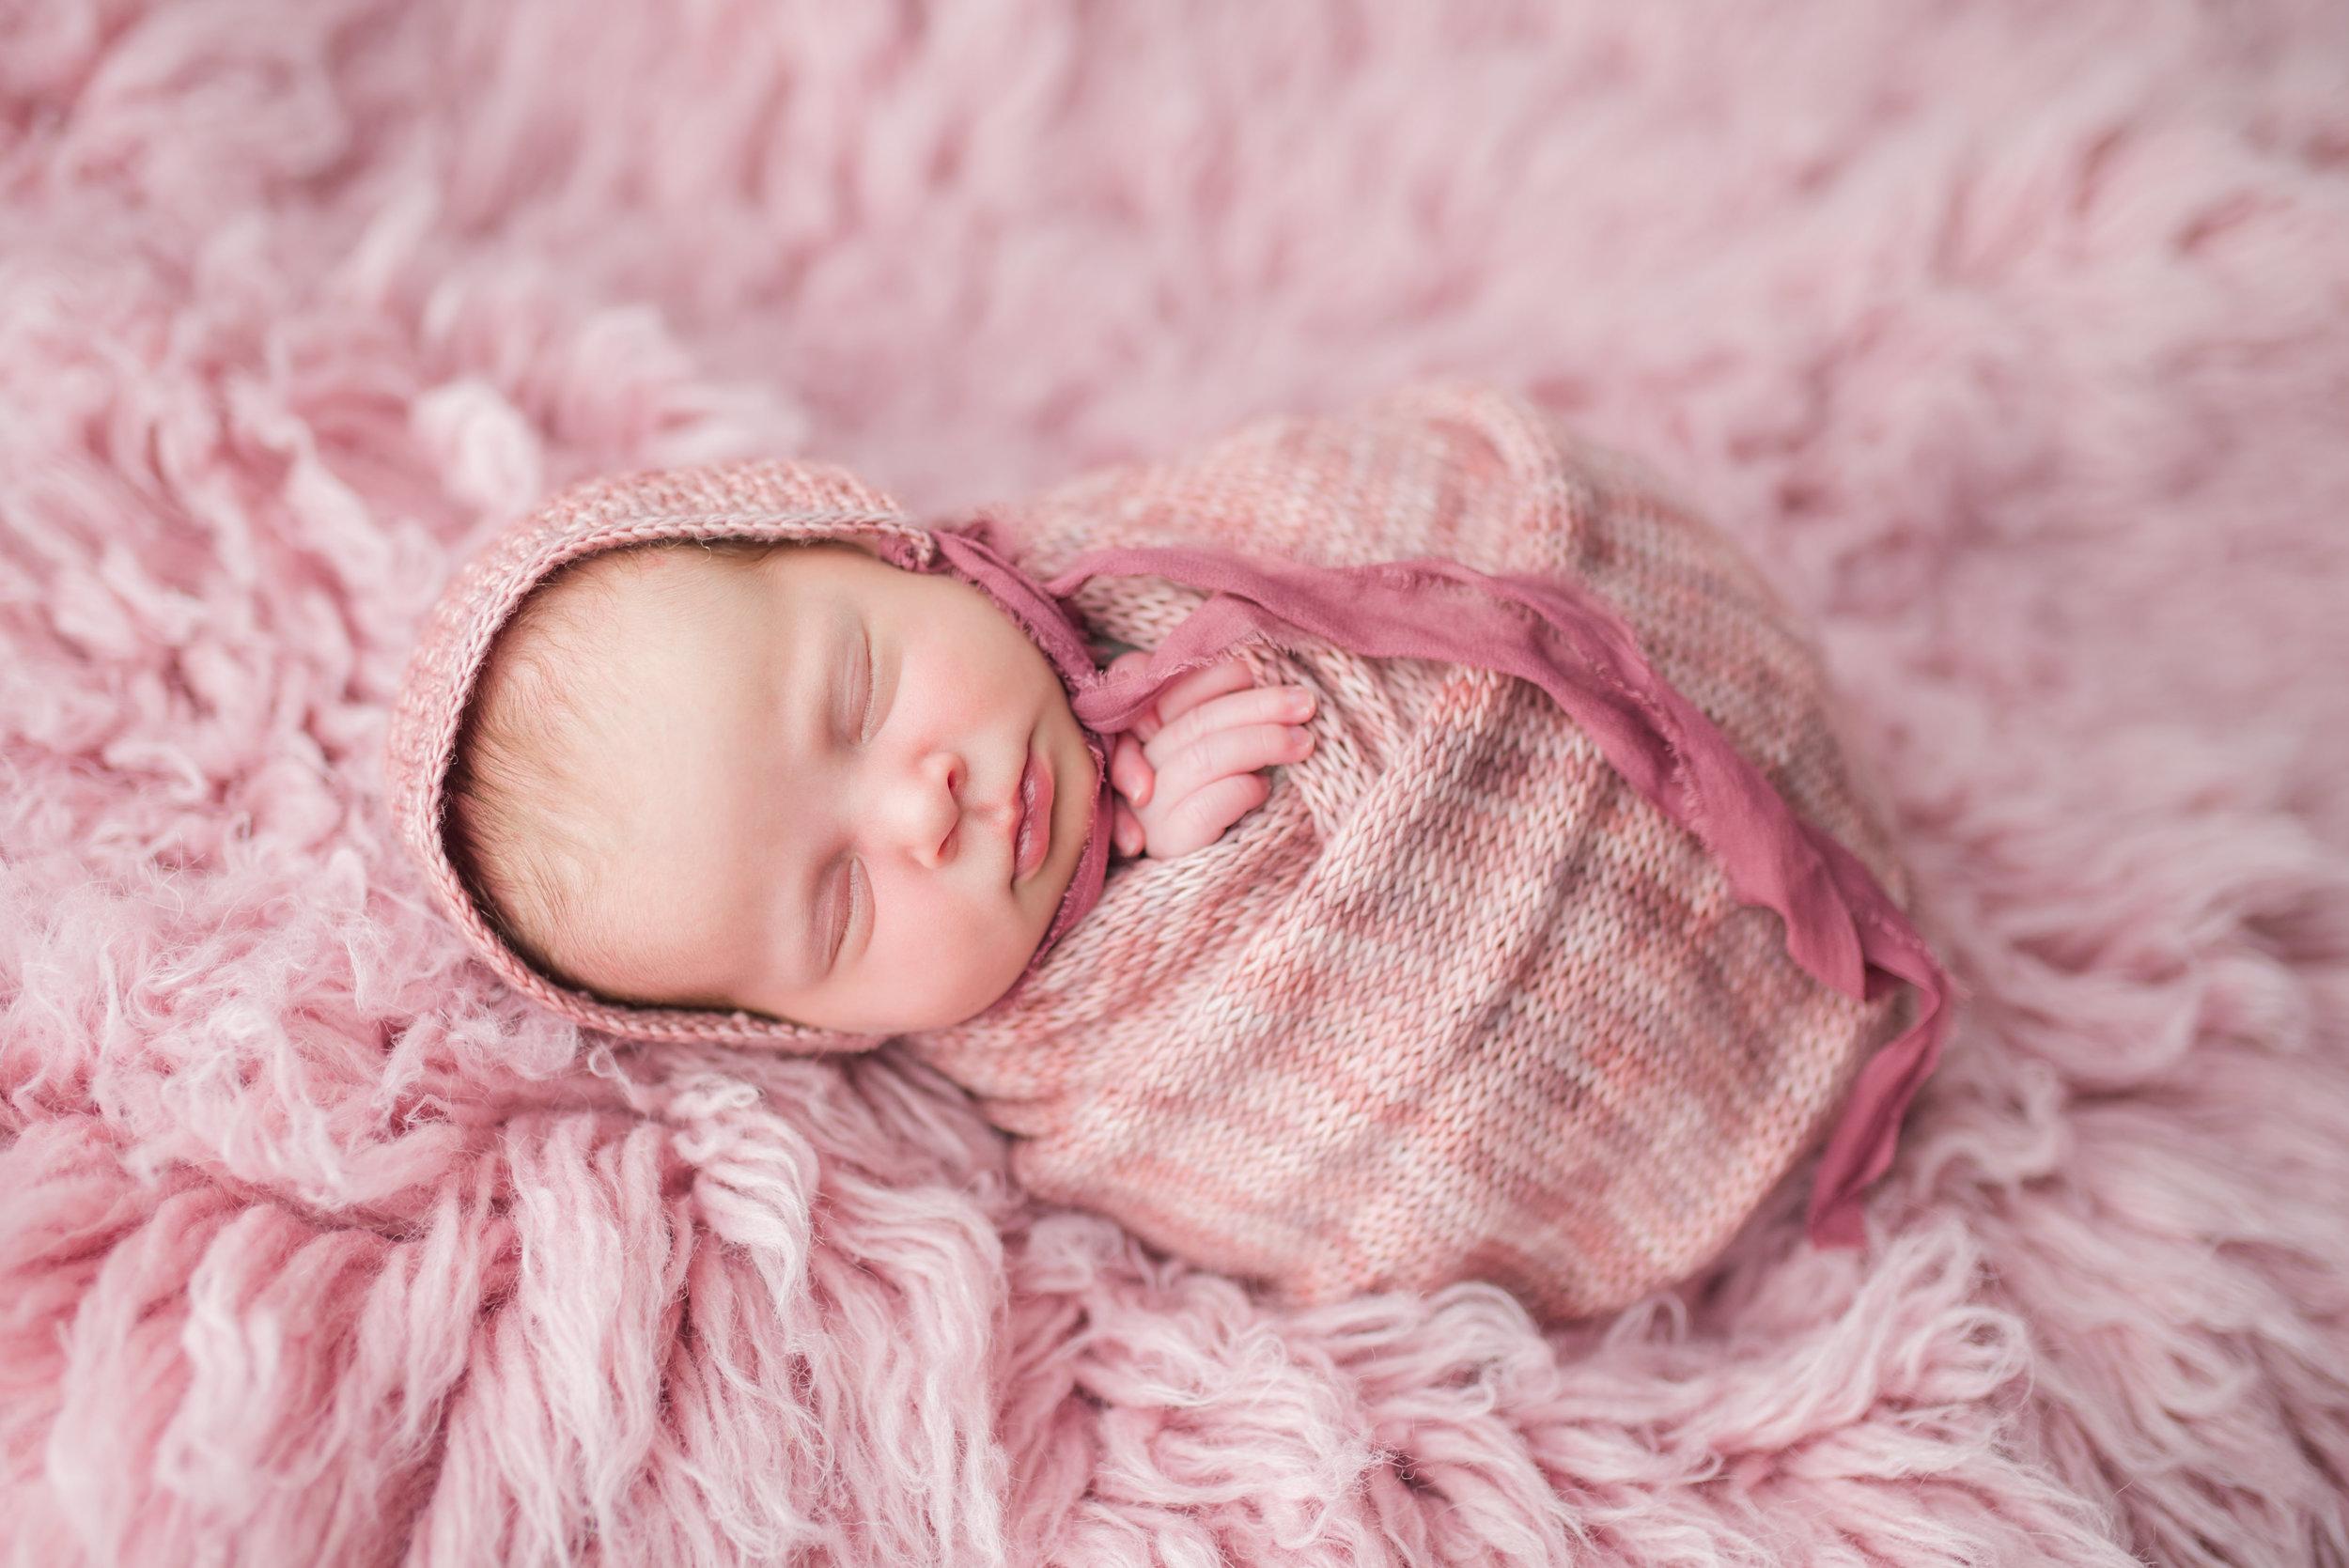 hazard-family-photographer-newborn